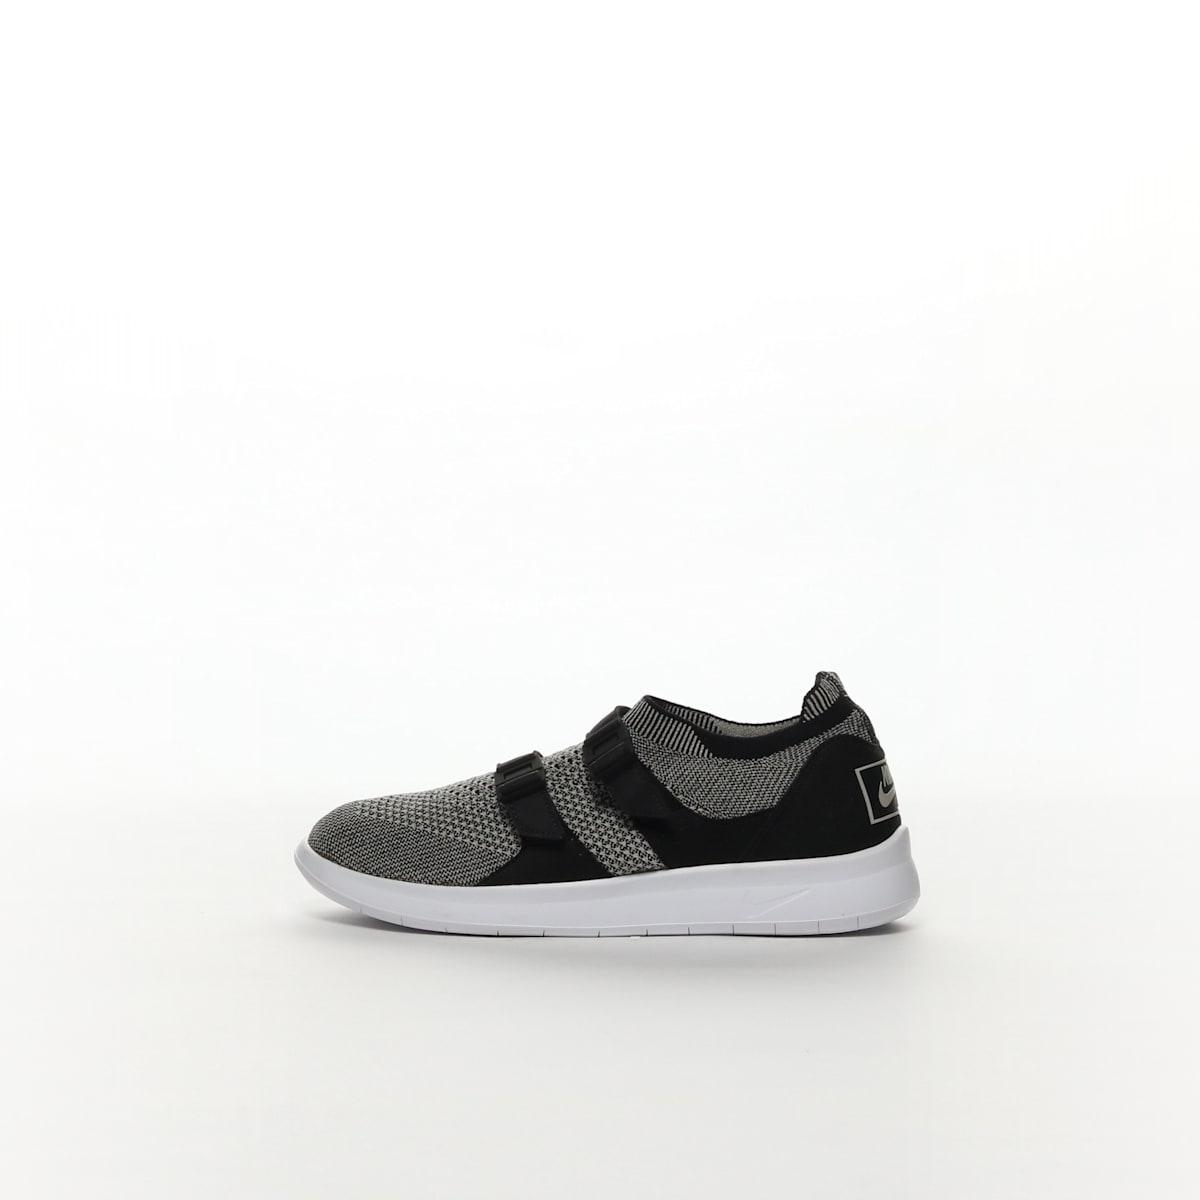 dd6bfdb589868 Men s Nike Air Sock Racer Ultra Flyknit Shoe - BLACK PALGRY – Resku